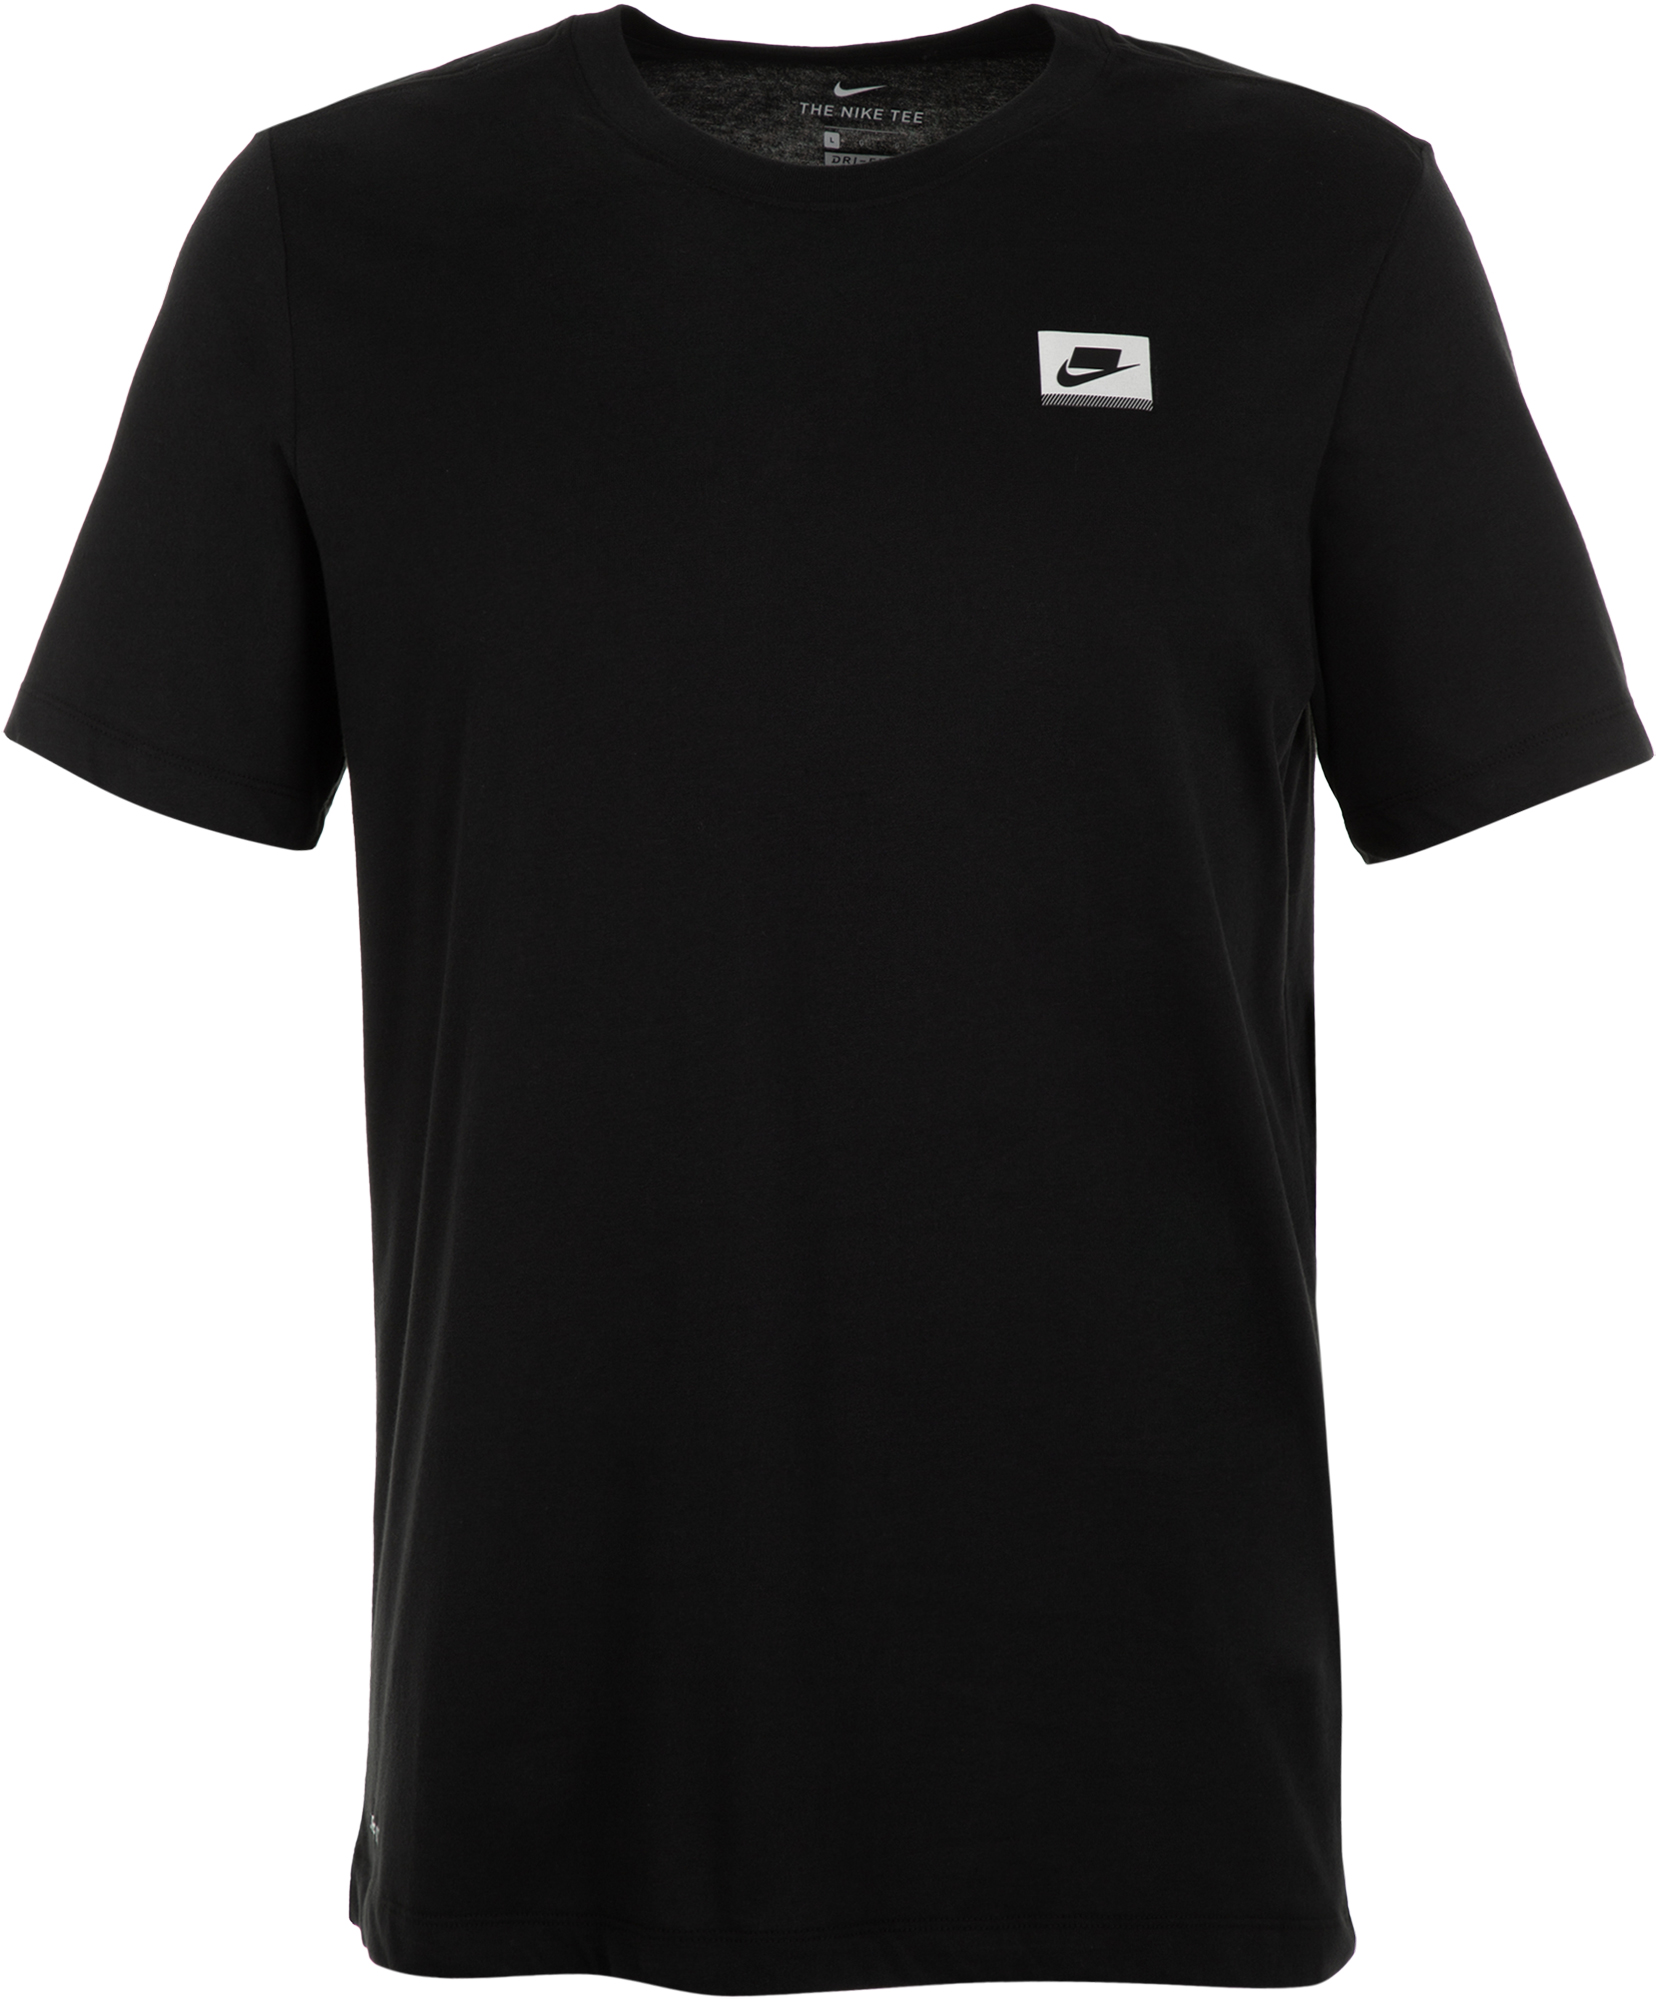 Nike Футболка мужская Dry Dangerous, размер 50-52